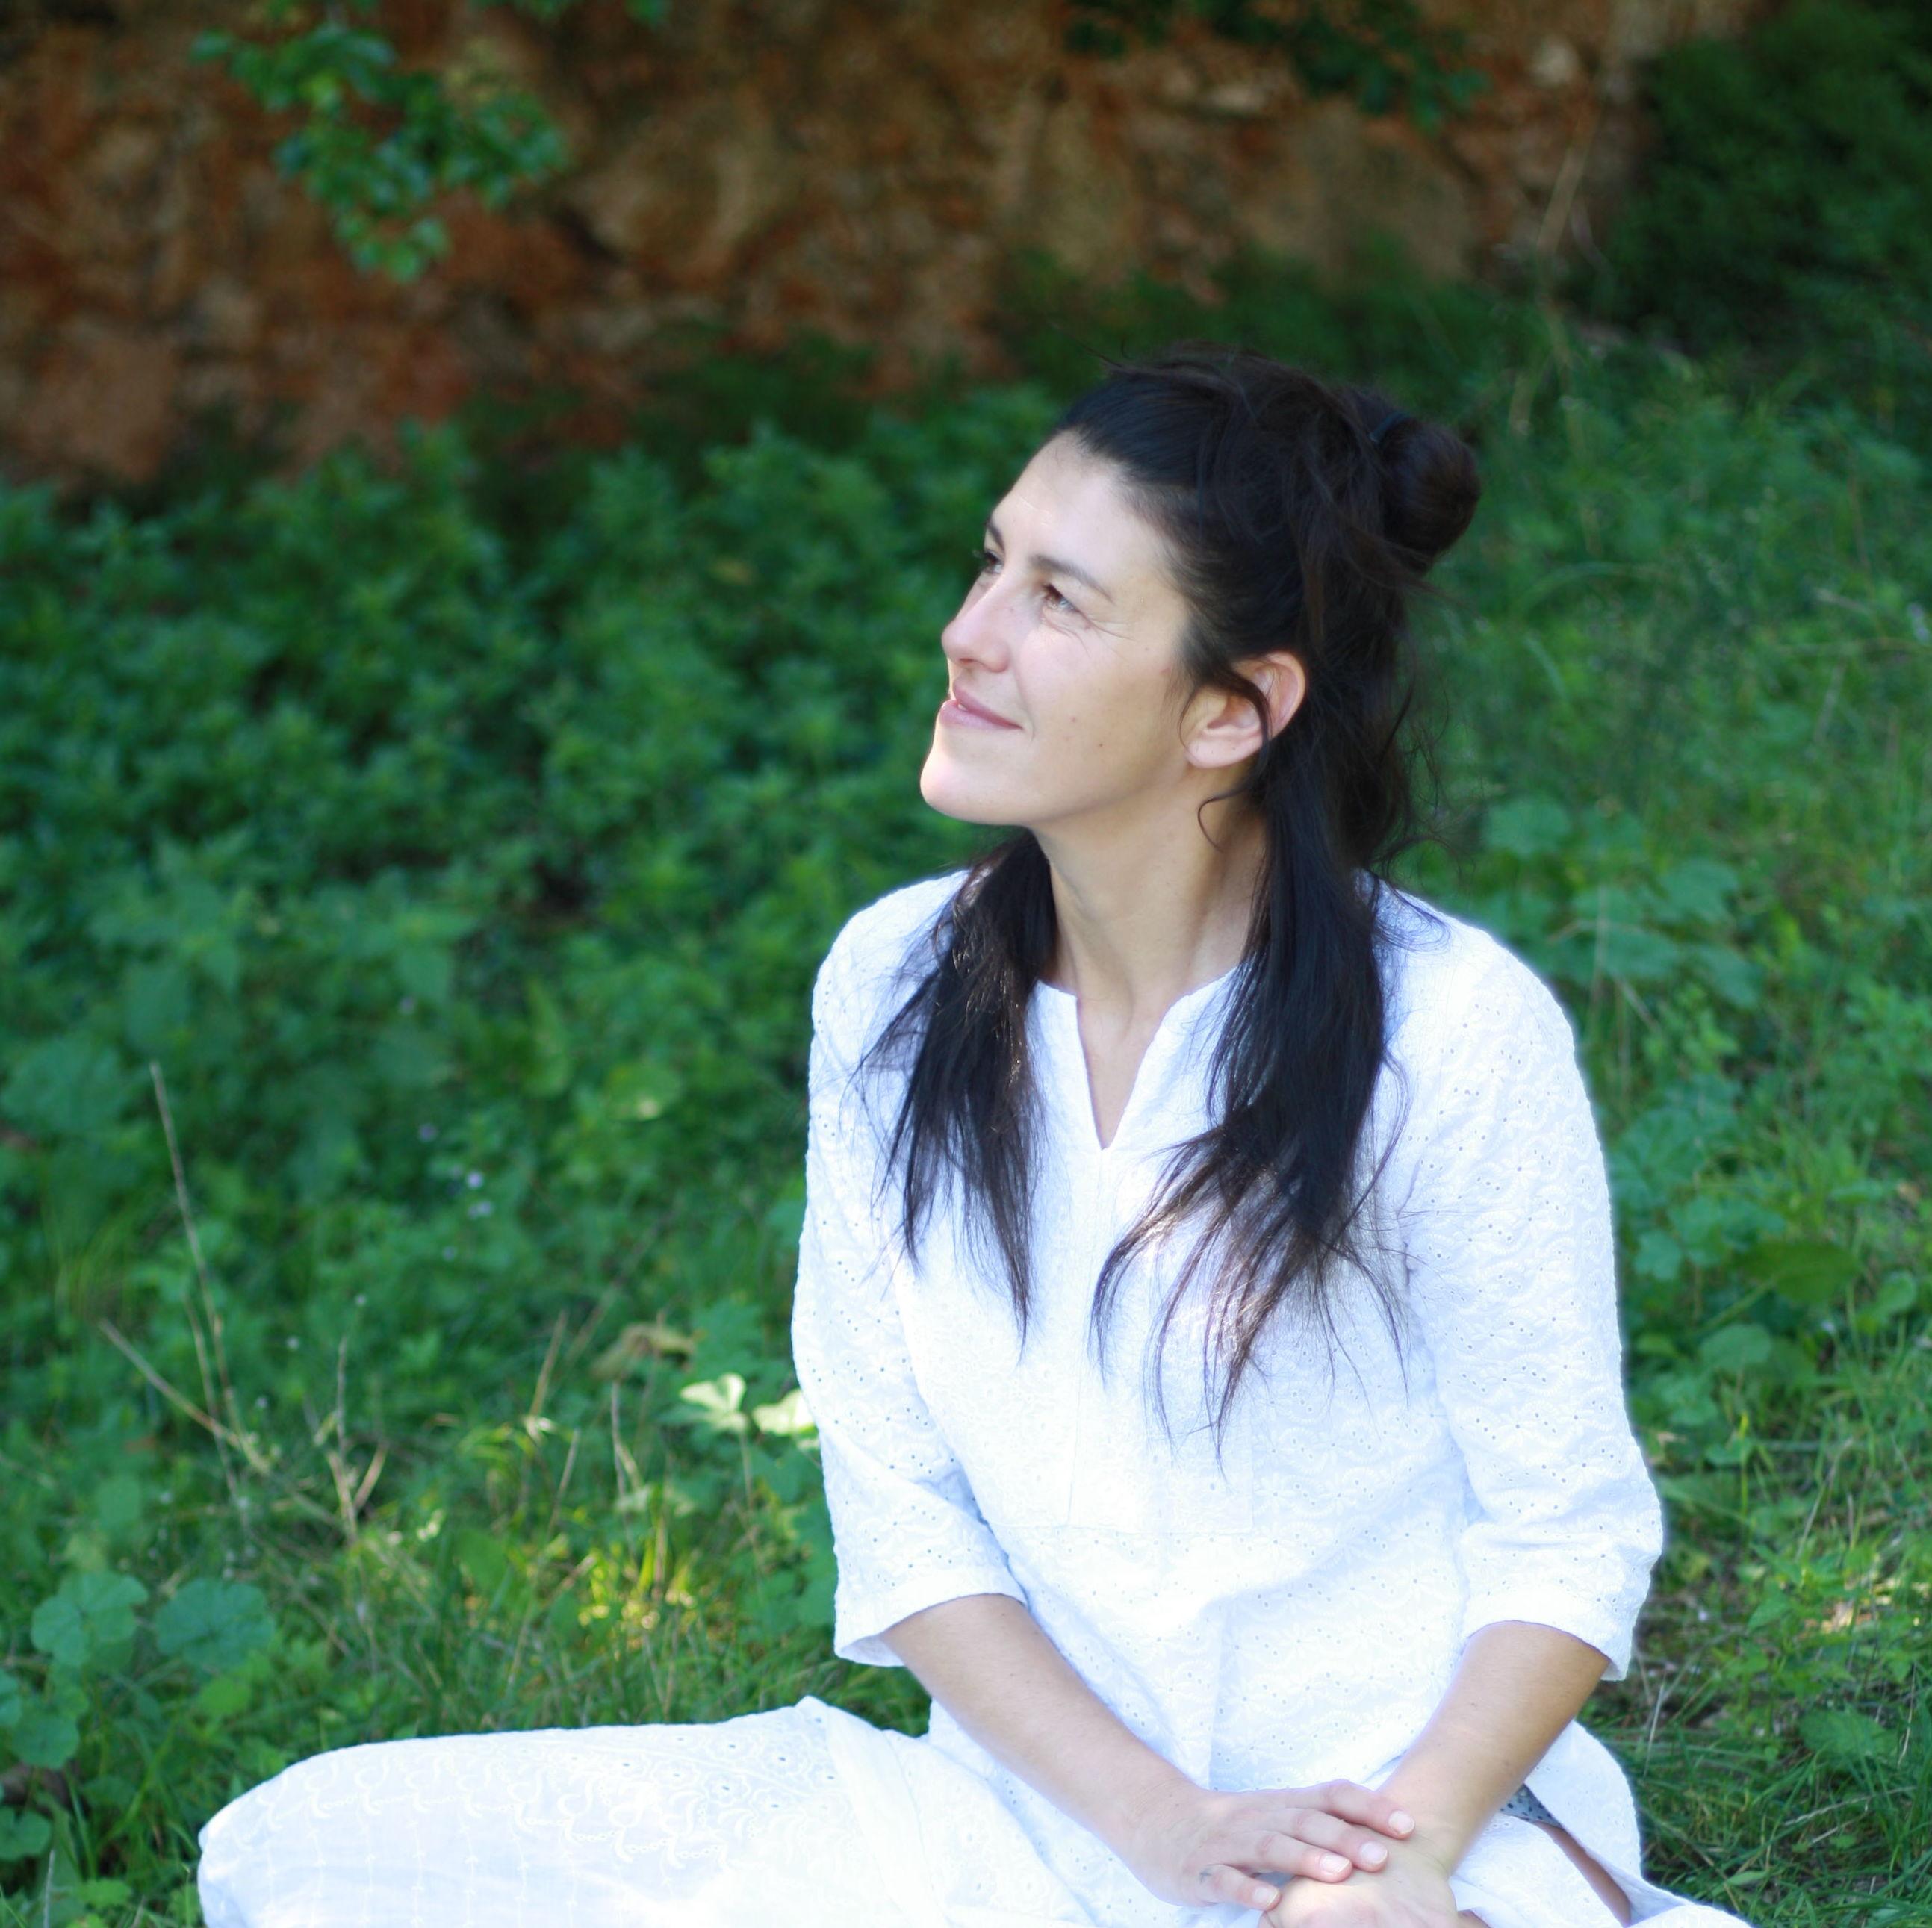 Meditación : Servicios de Sé Feliz Contigo